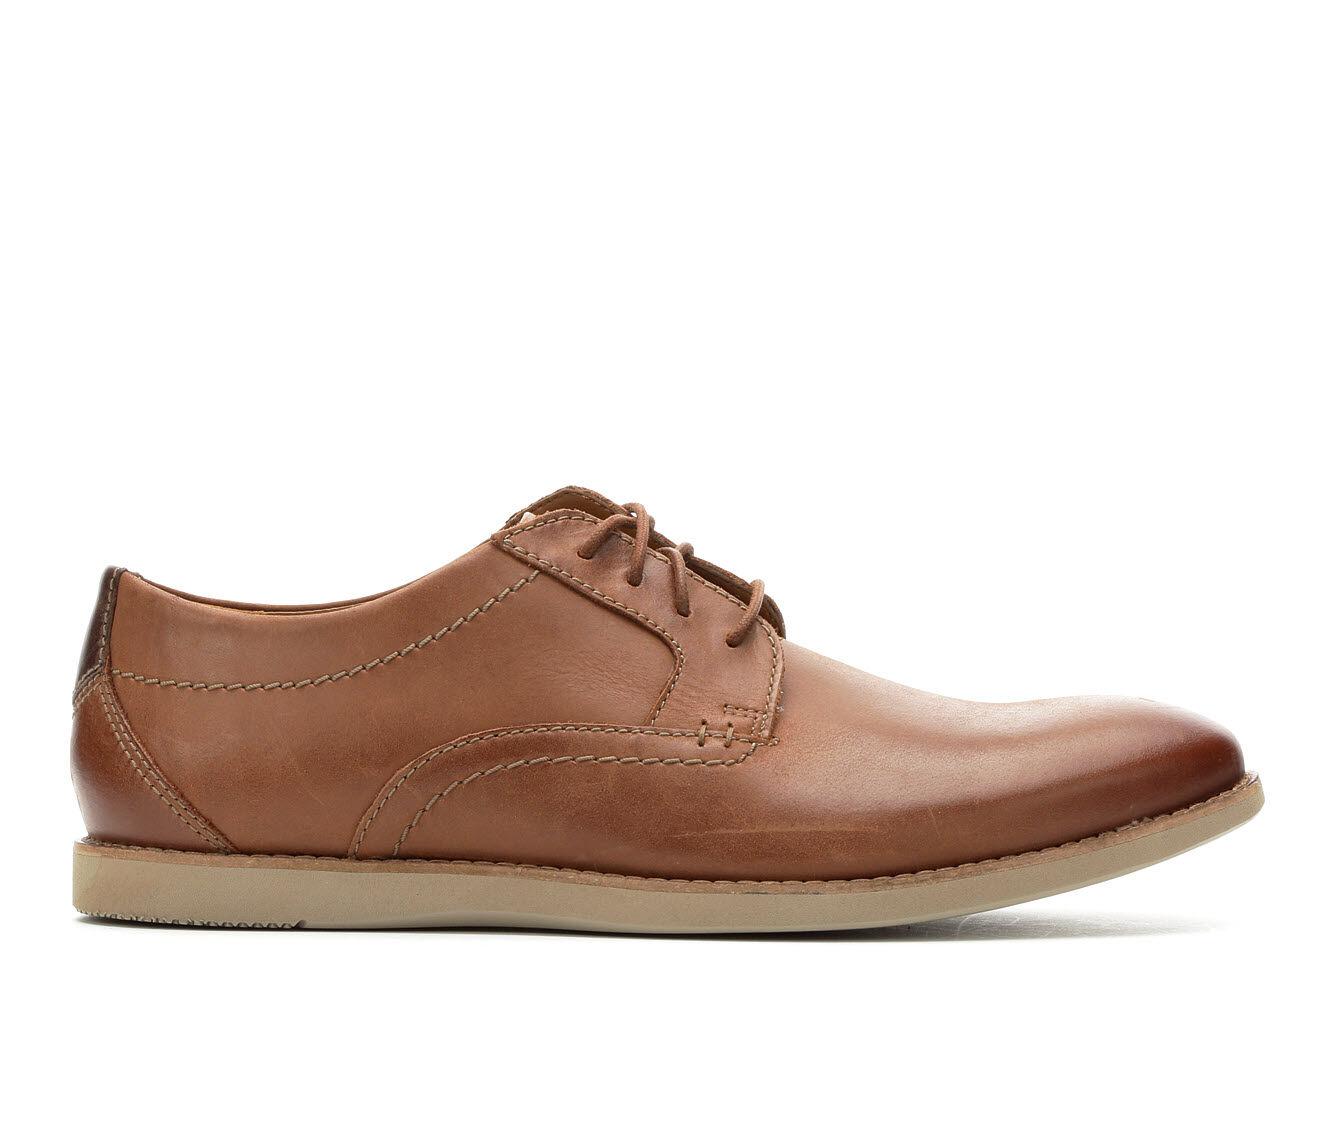 Men's Clarks Raharto Plain Toe Dress Shoes Dark Tan